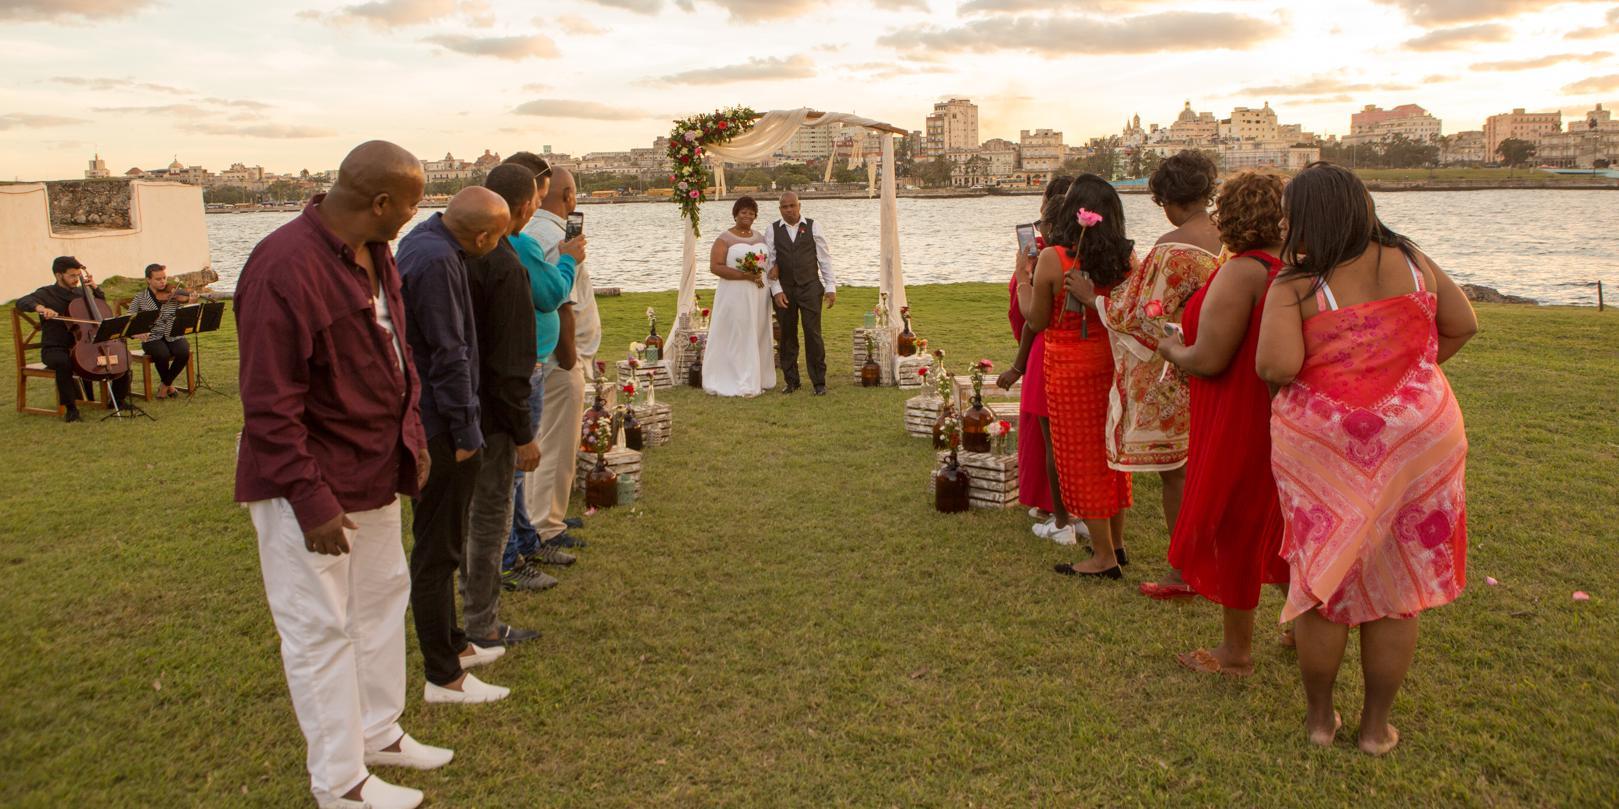 bodas-sin-clasificar-sin-tema-cuba-42111.jpg